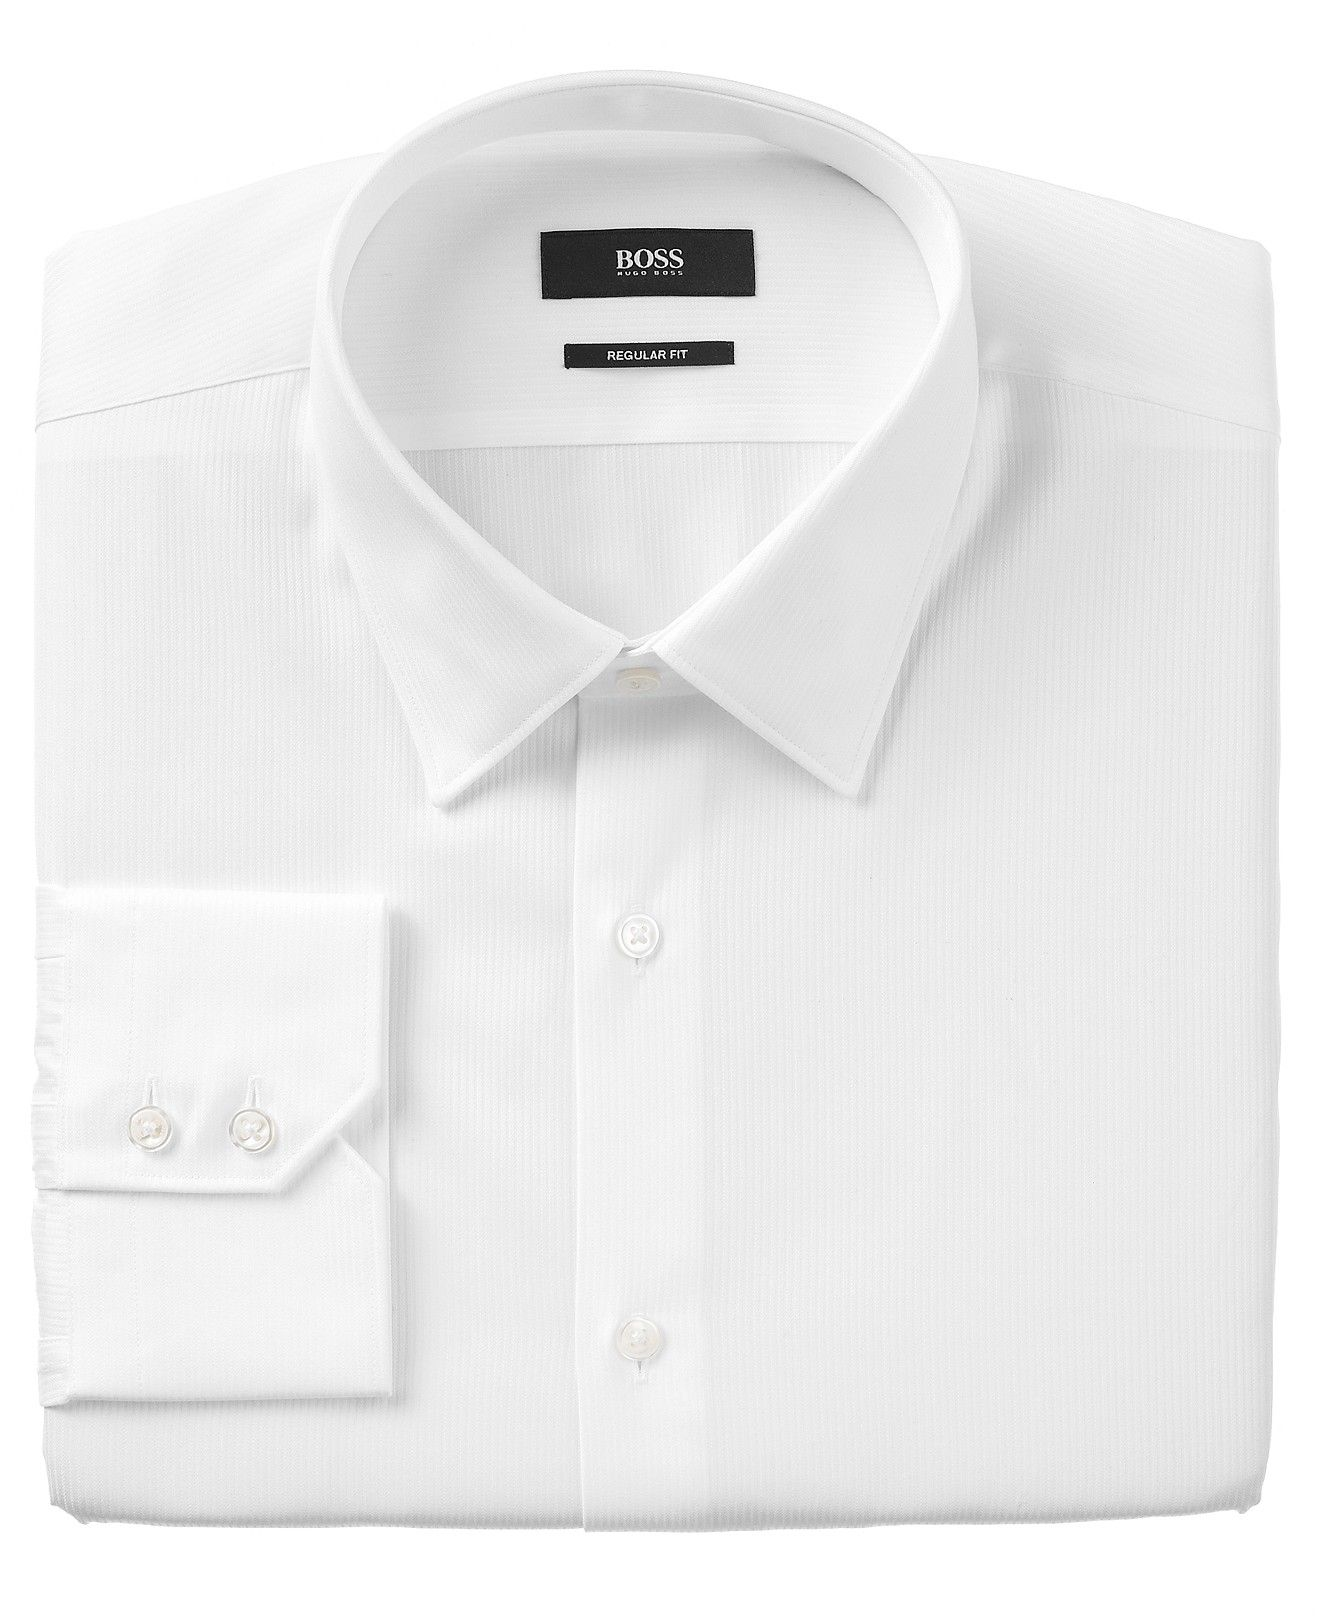 30f35be8a $79.99 Doctor Shirt BOSS by Hugo Boss Micro-Striped Dress Shirt - Dress  Shirts - Men - Macy's